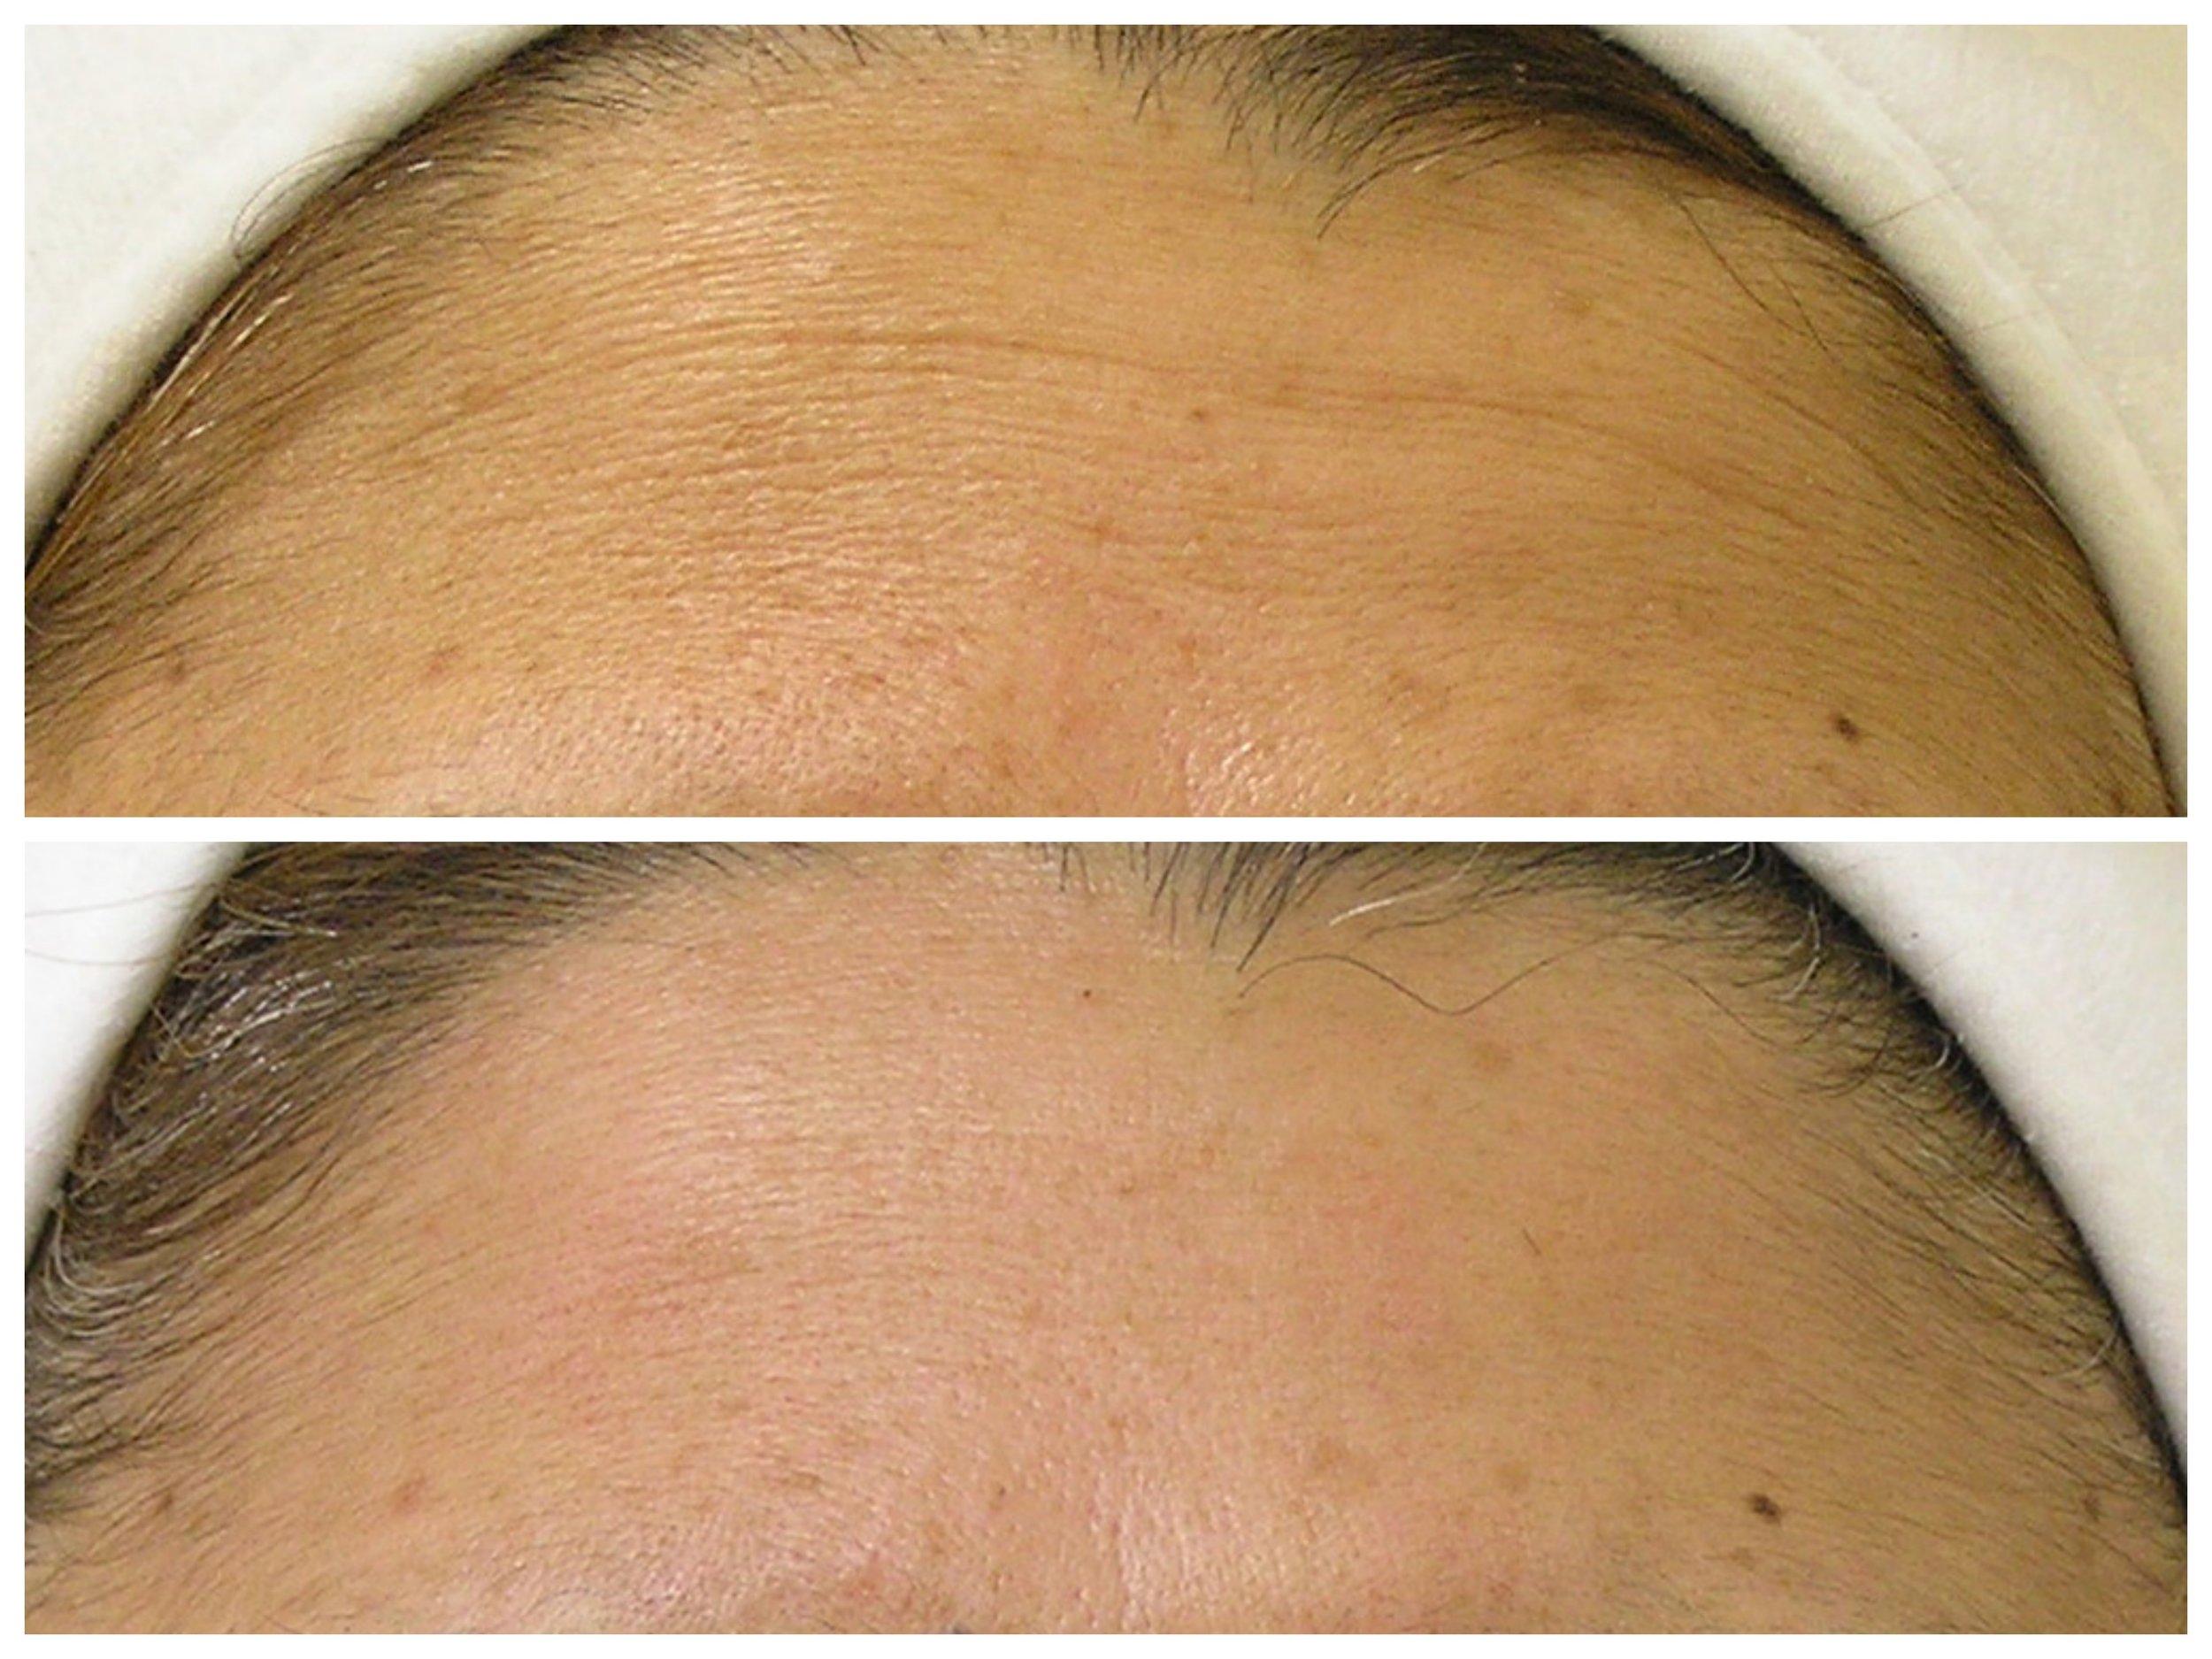 Fine Lines on Forehead B&A1.jpg